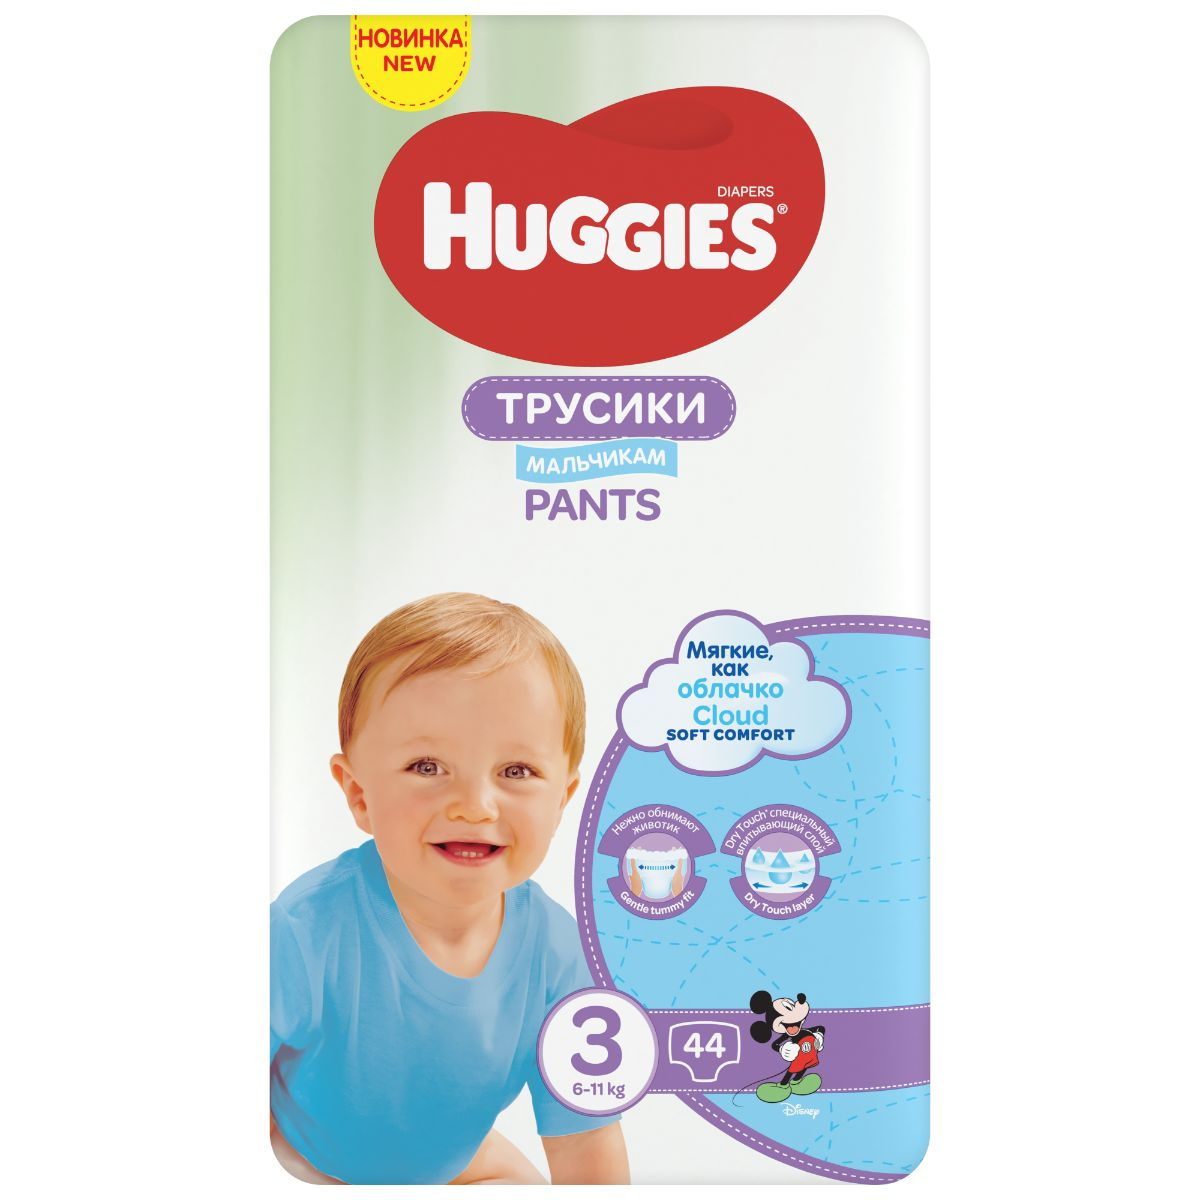 Scutece Huggies Chilotel Jumbo Nr 3, 6-11 Kg, 44 Buc